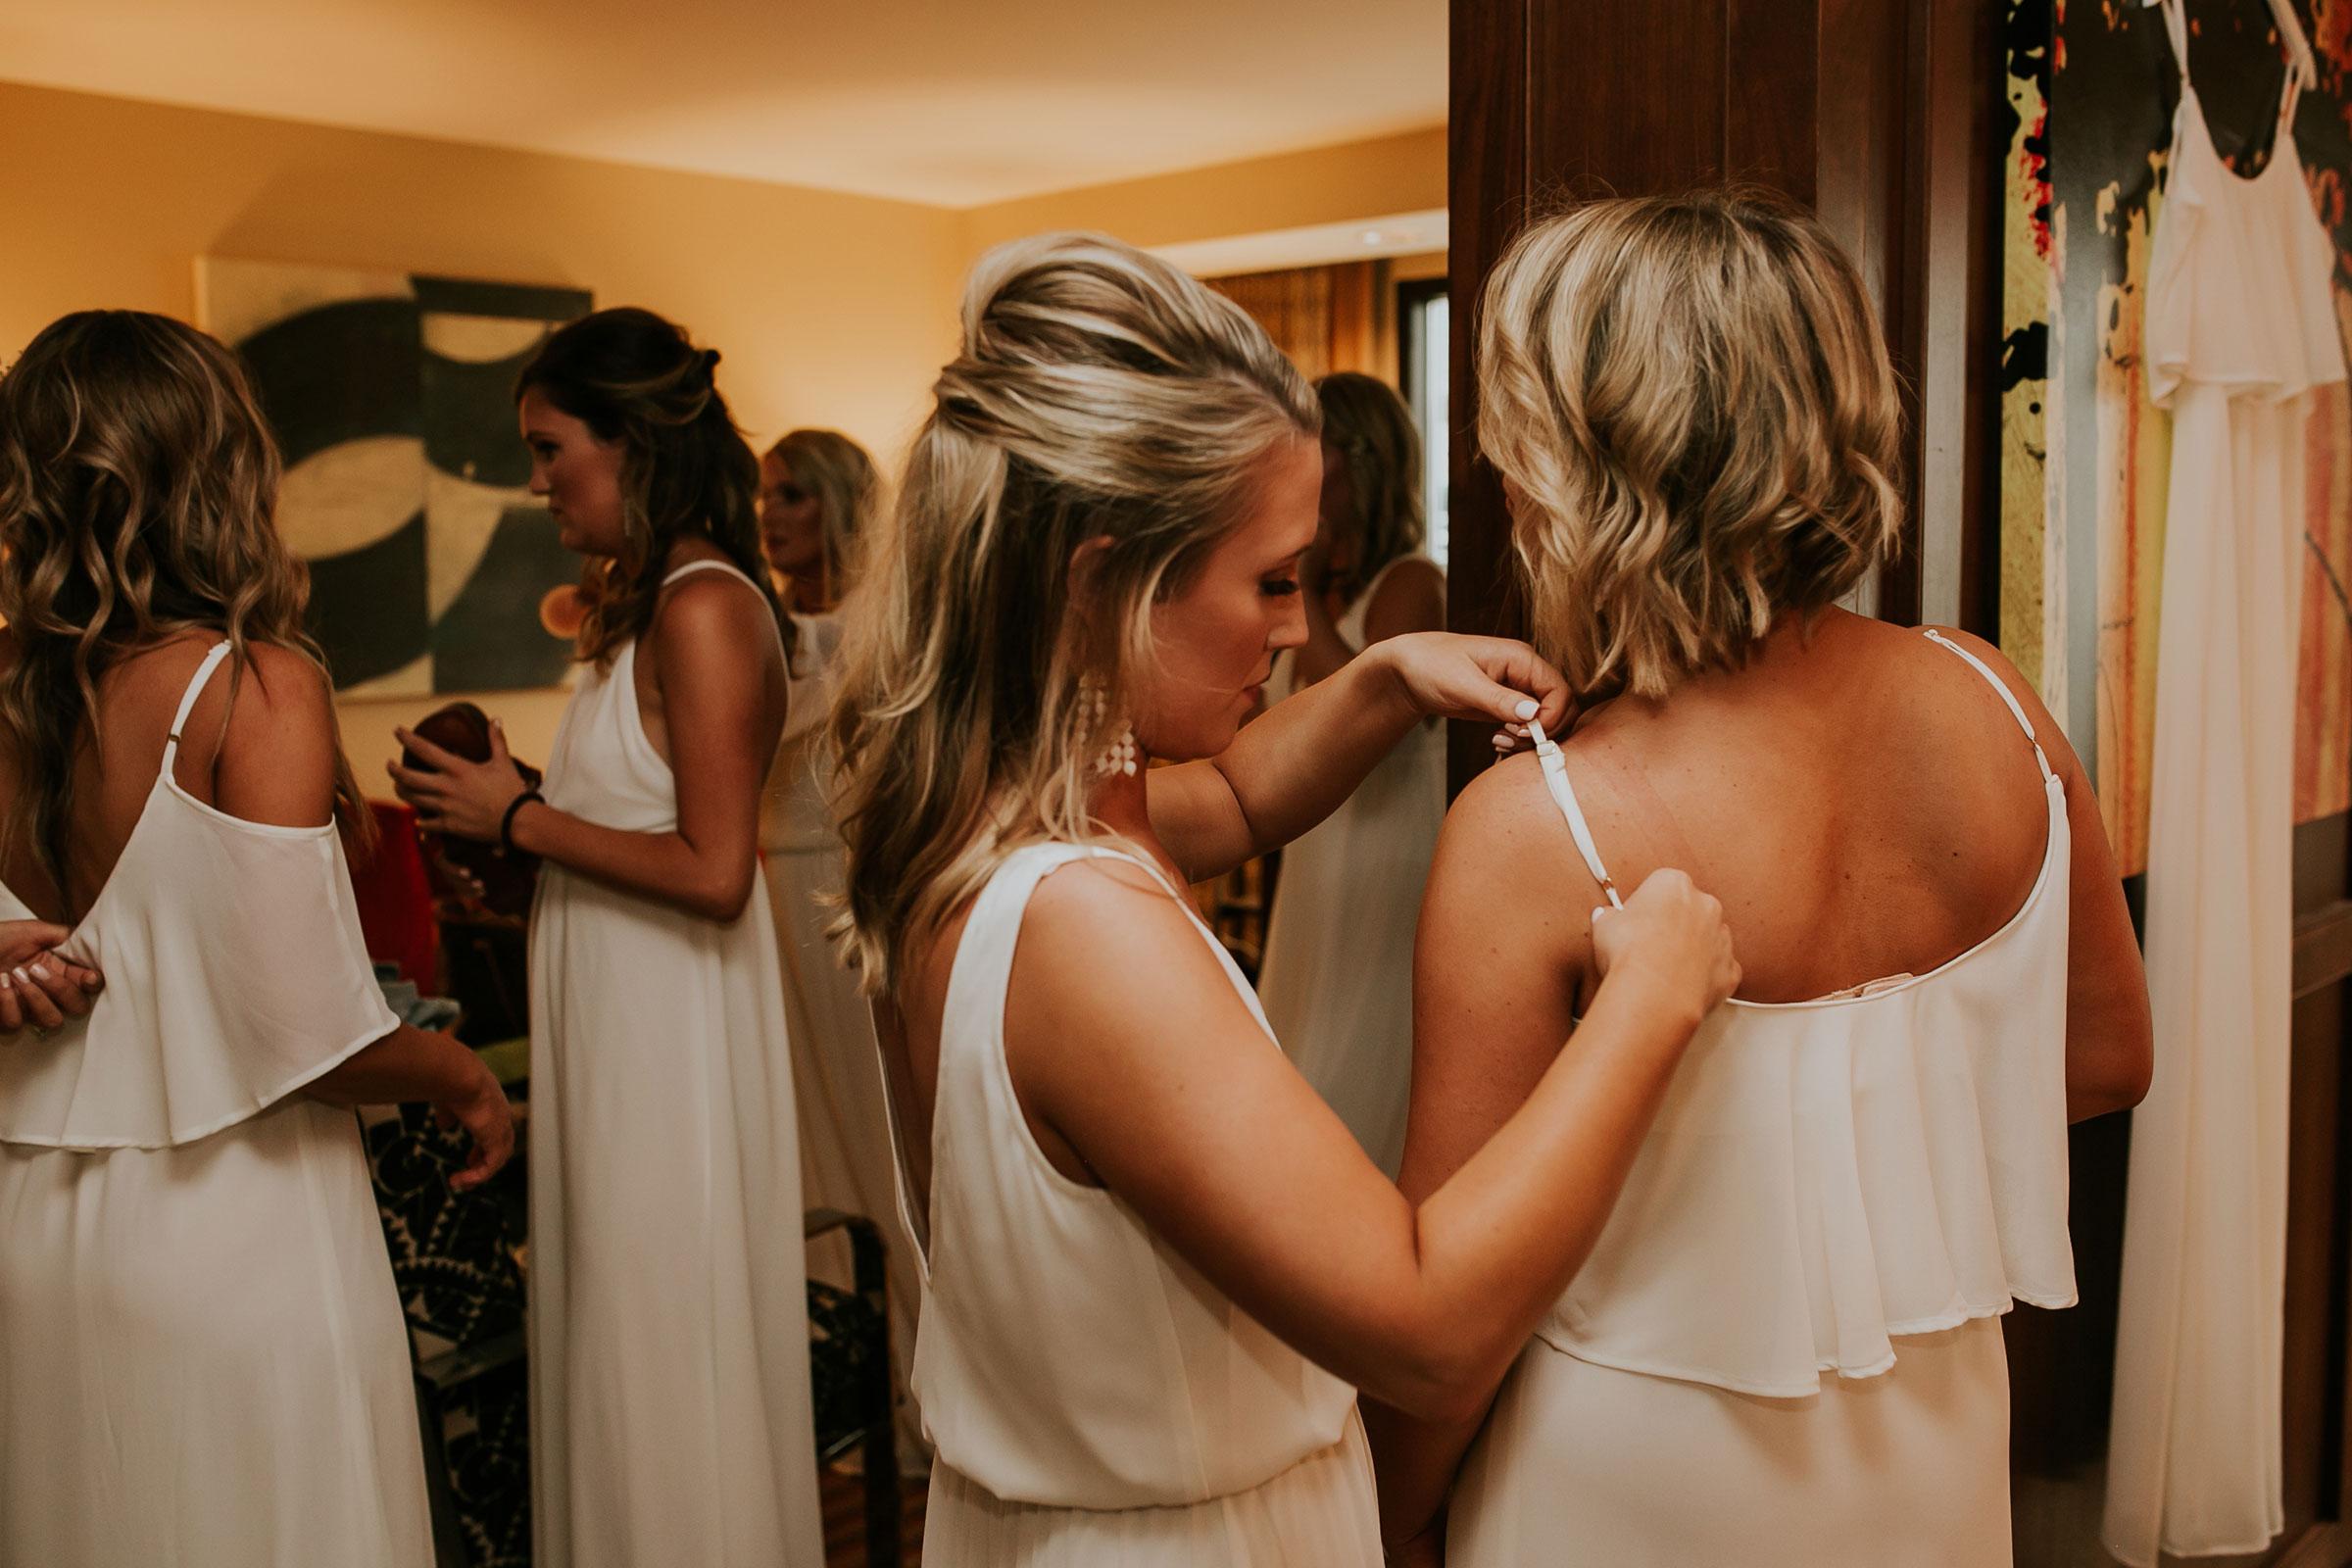 bridesmaids-getting-ready-hilton-omaha-nebraska-raelyn-ramey-photography.jpg